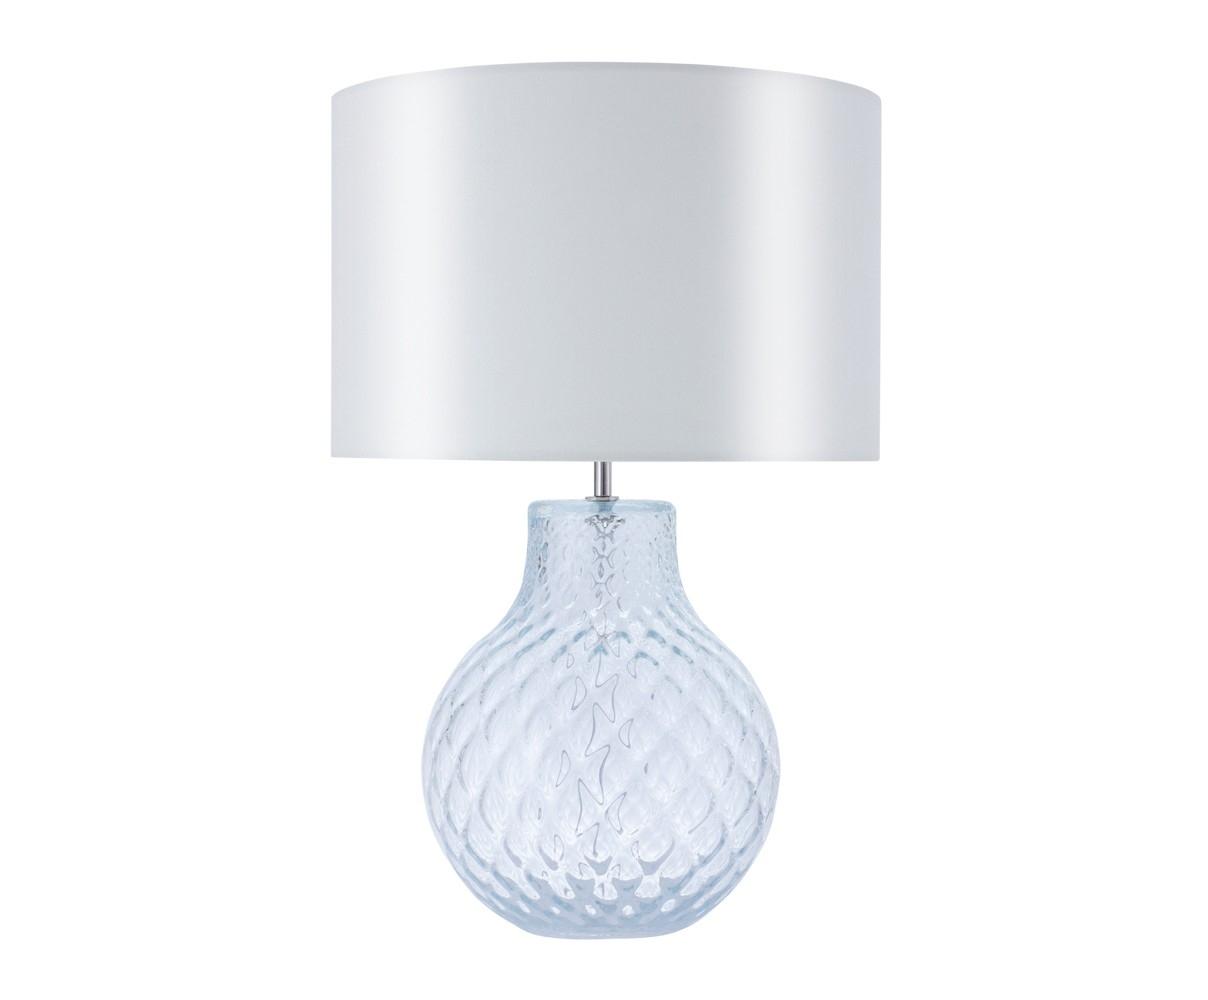 Купить Настольная лампа с белым абажуром, inmyroom, Португалия